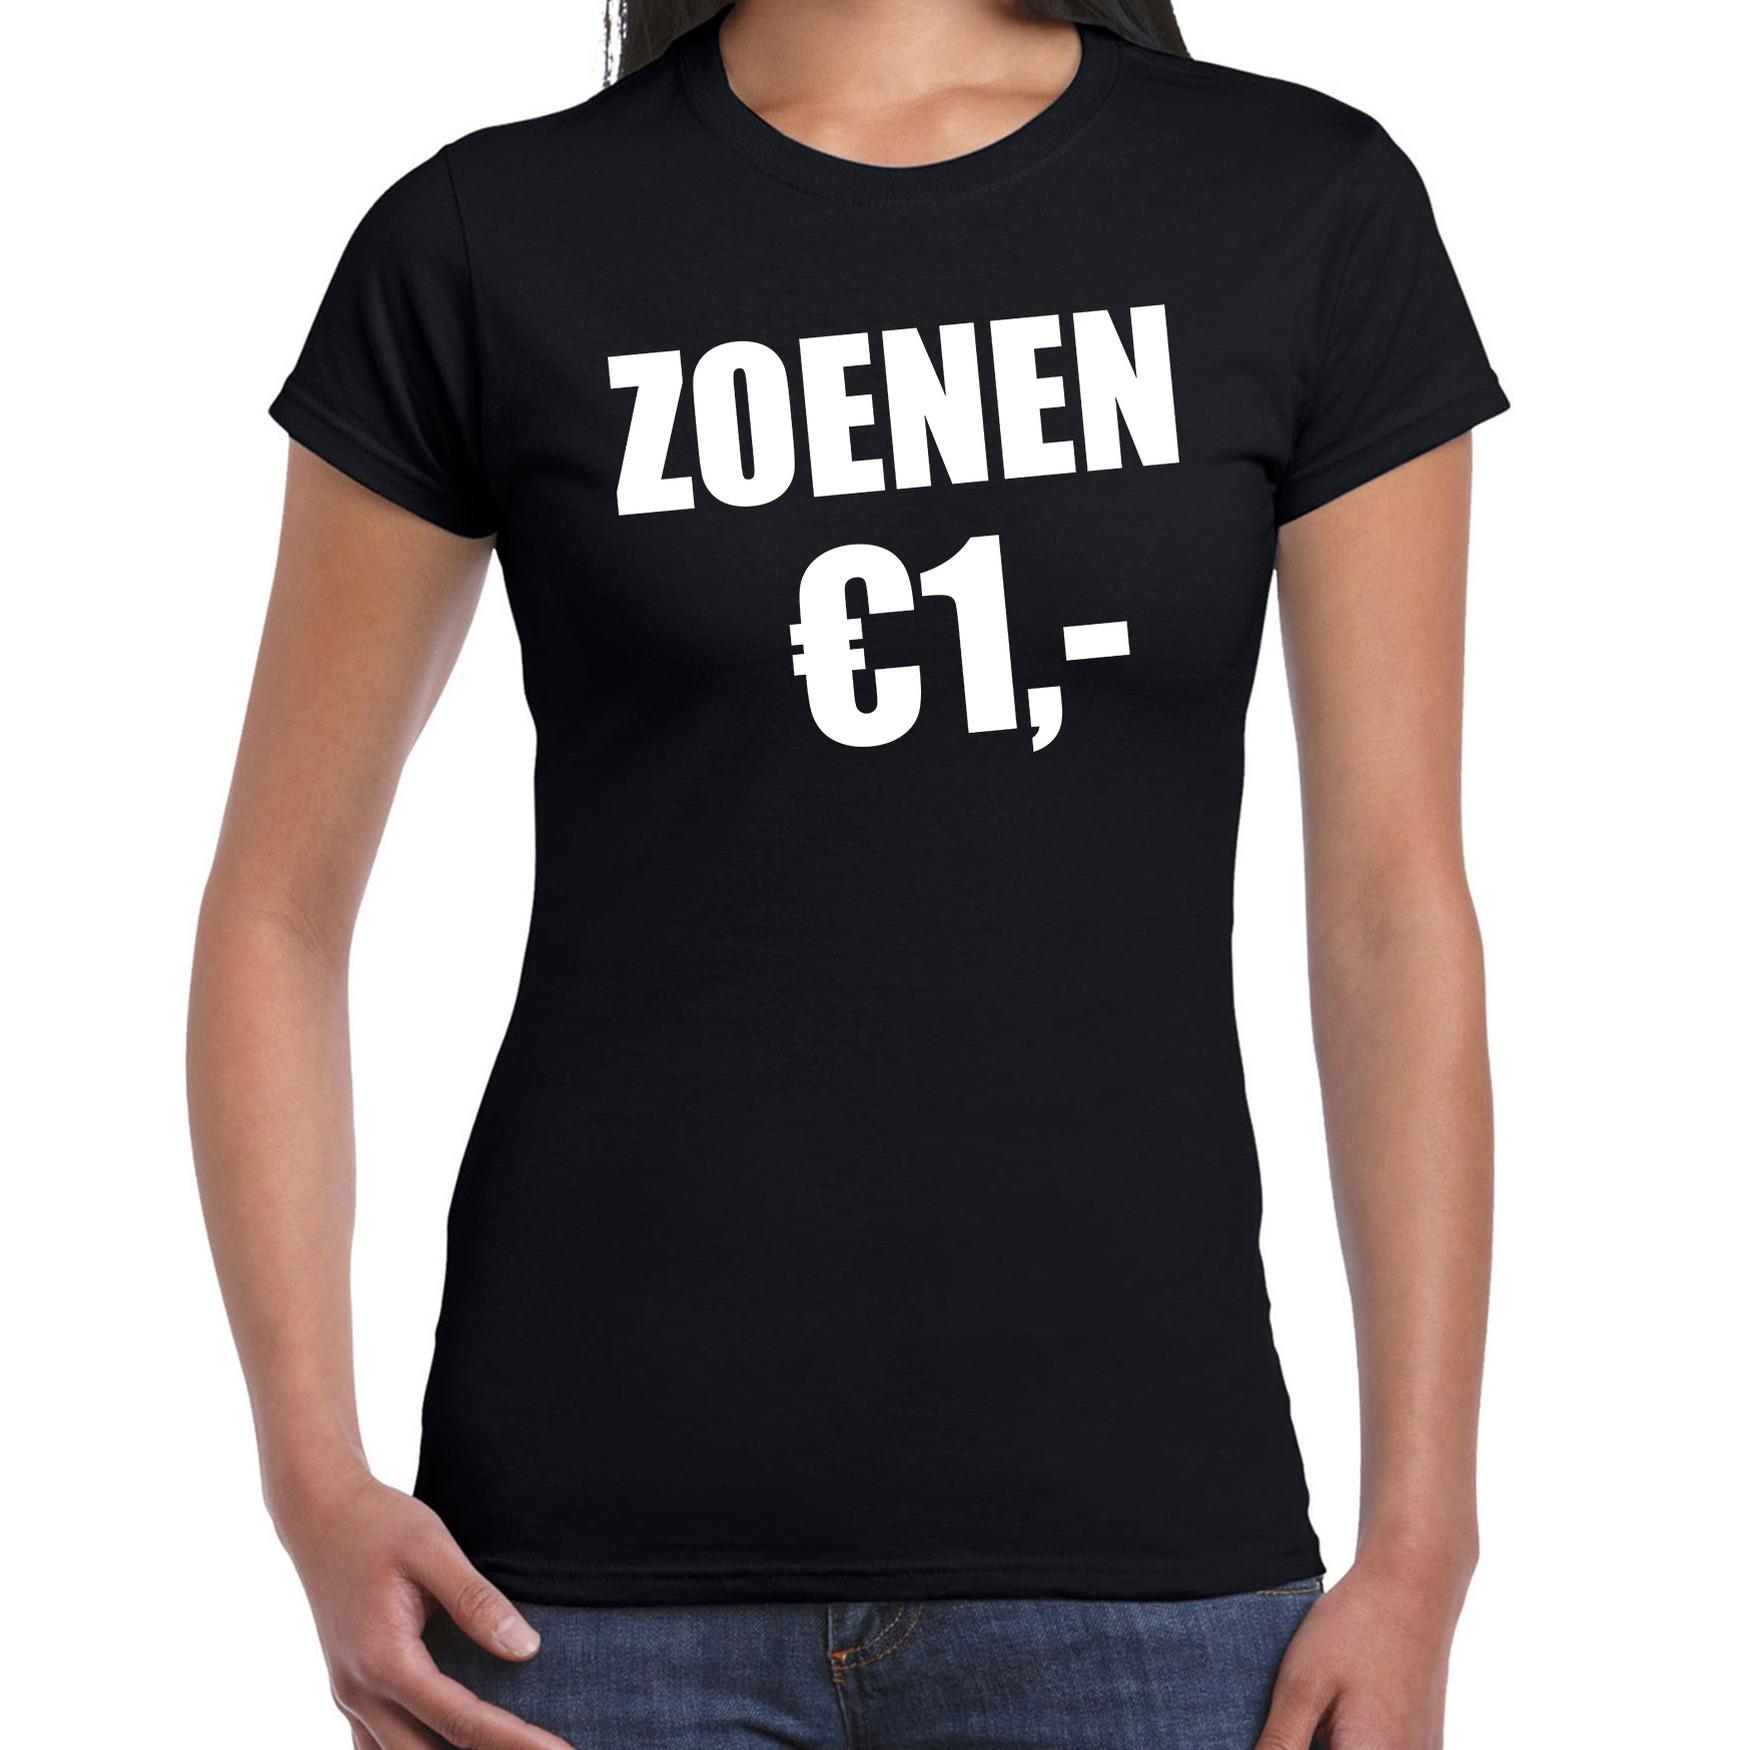 Fun t-shirt zoenen 1 euro zwart voor dames M -